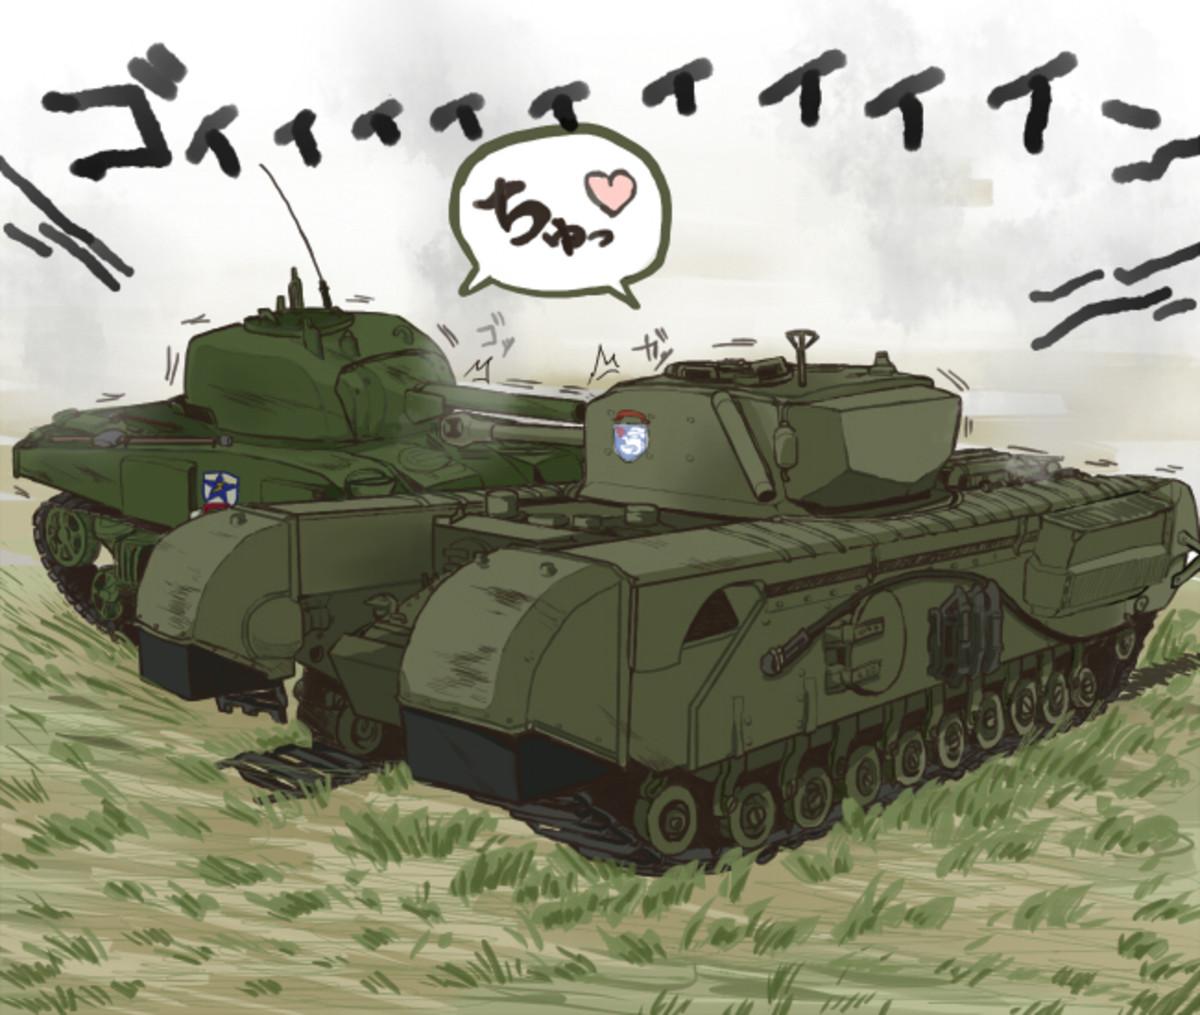 SMOOCH~❤. Source https://www.pixiv.net/memberillust.php?mode=medium&illustid=64595718 join list: MilitaryWaifu (489 subs)Mention History join list: